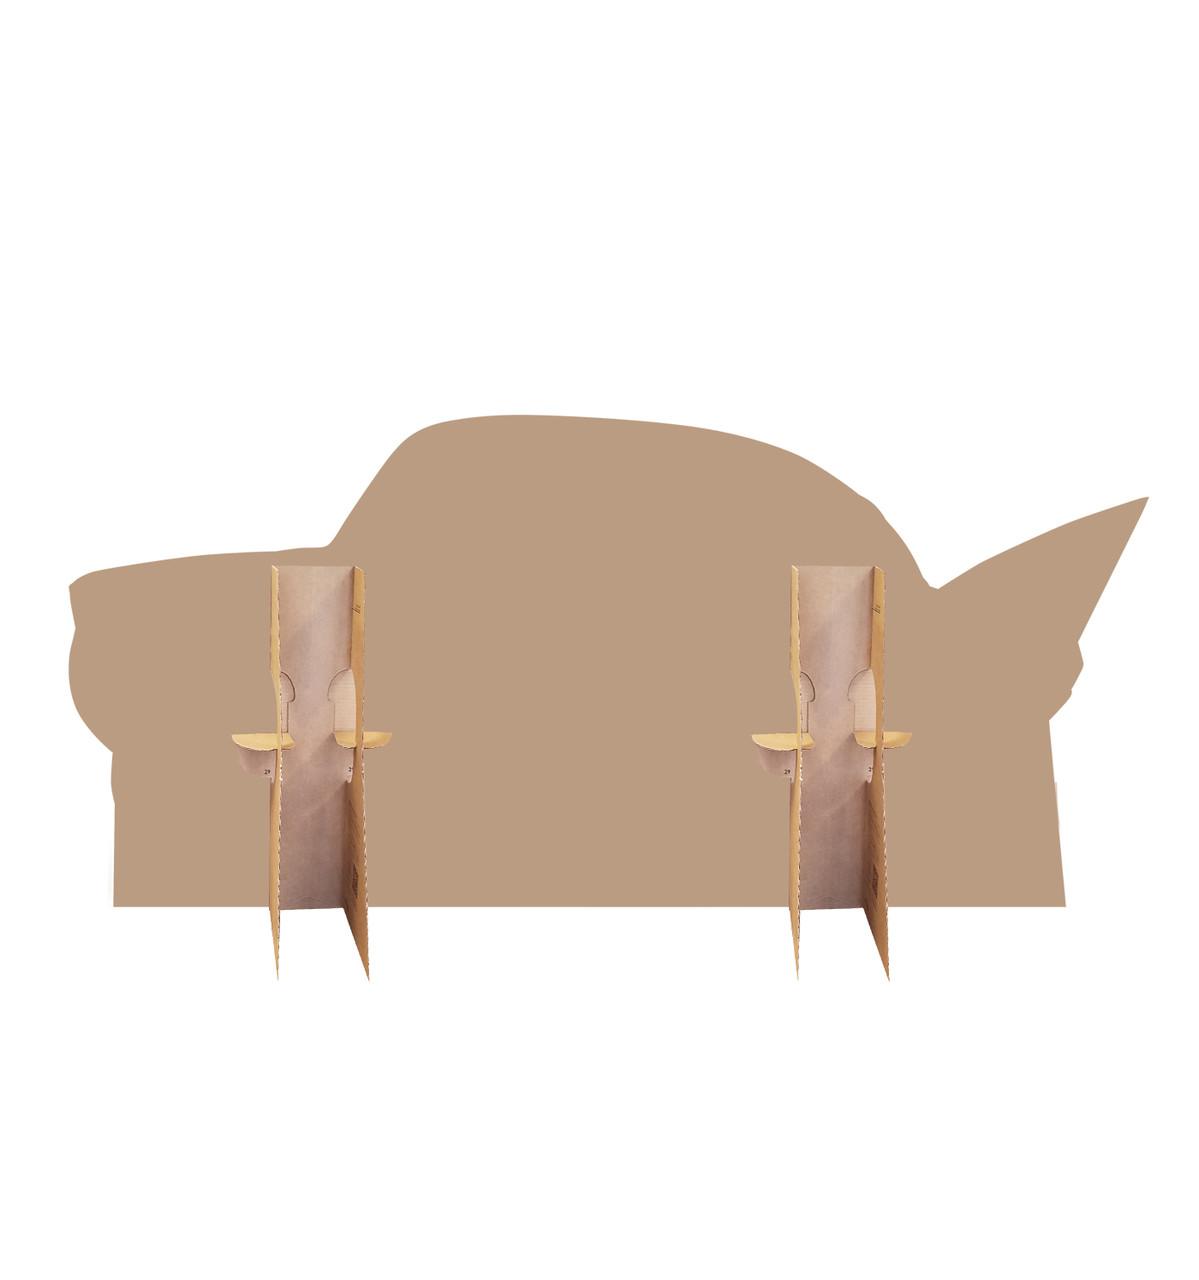 Life-size Flo (Cars 3) Cardboard Standup